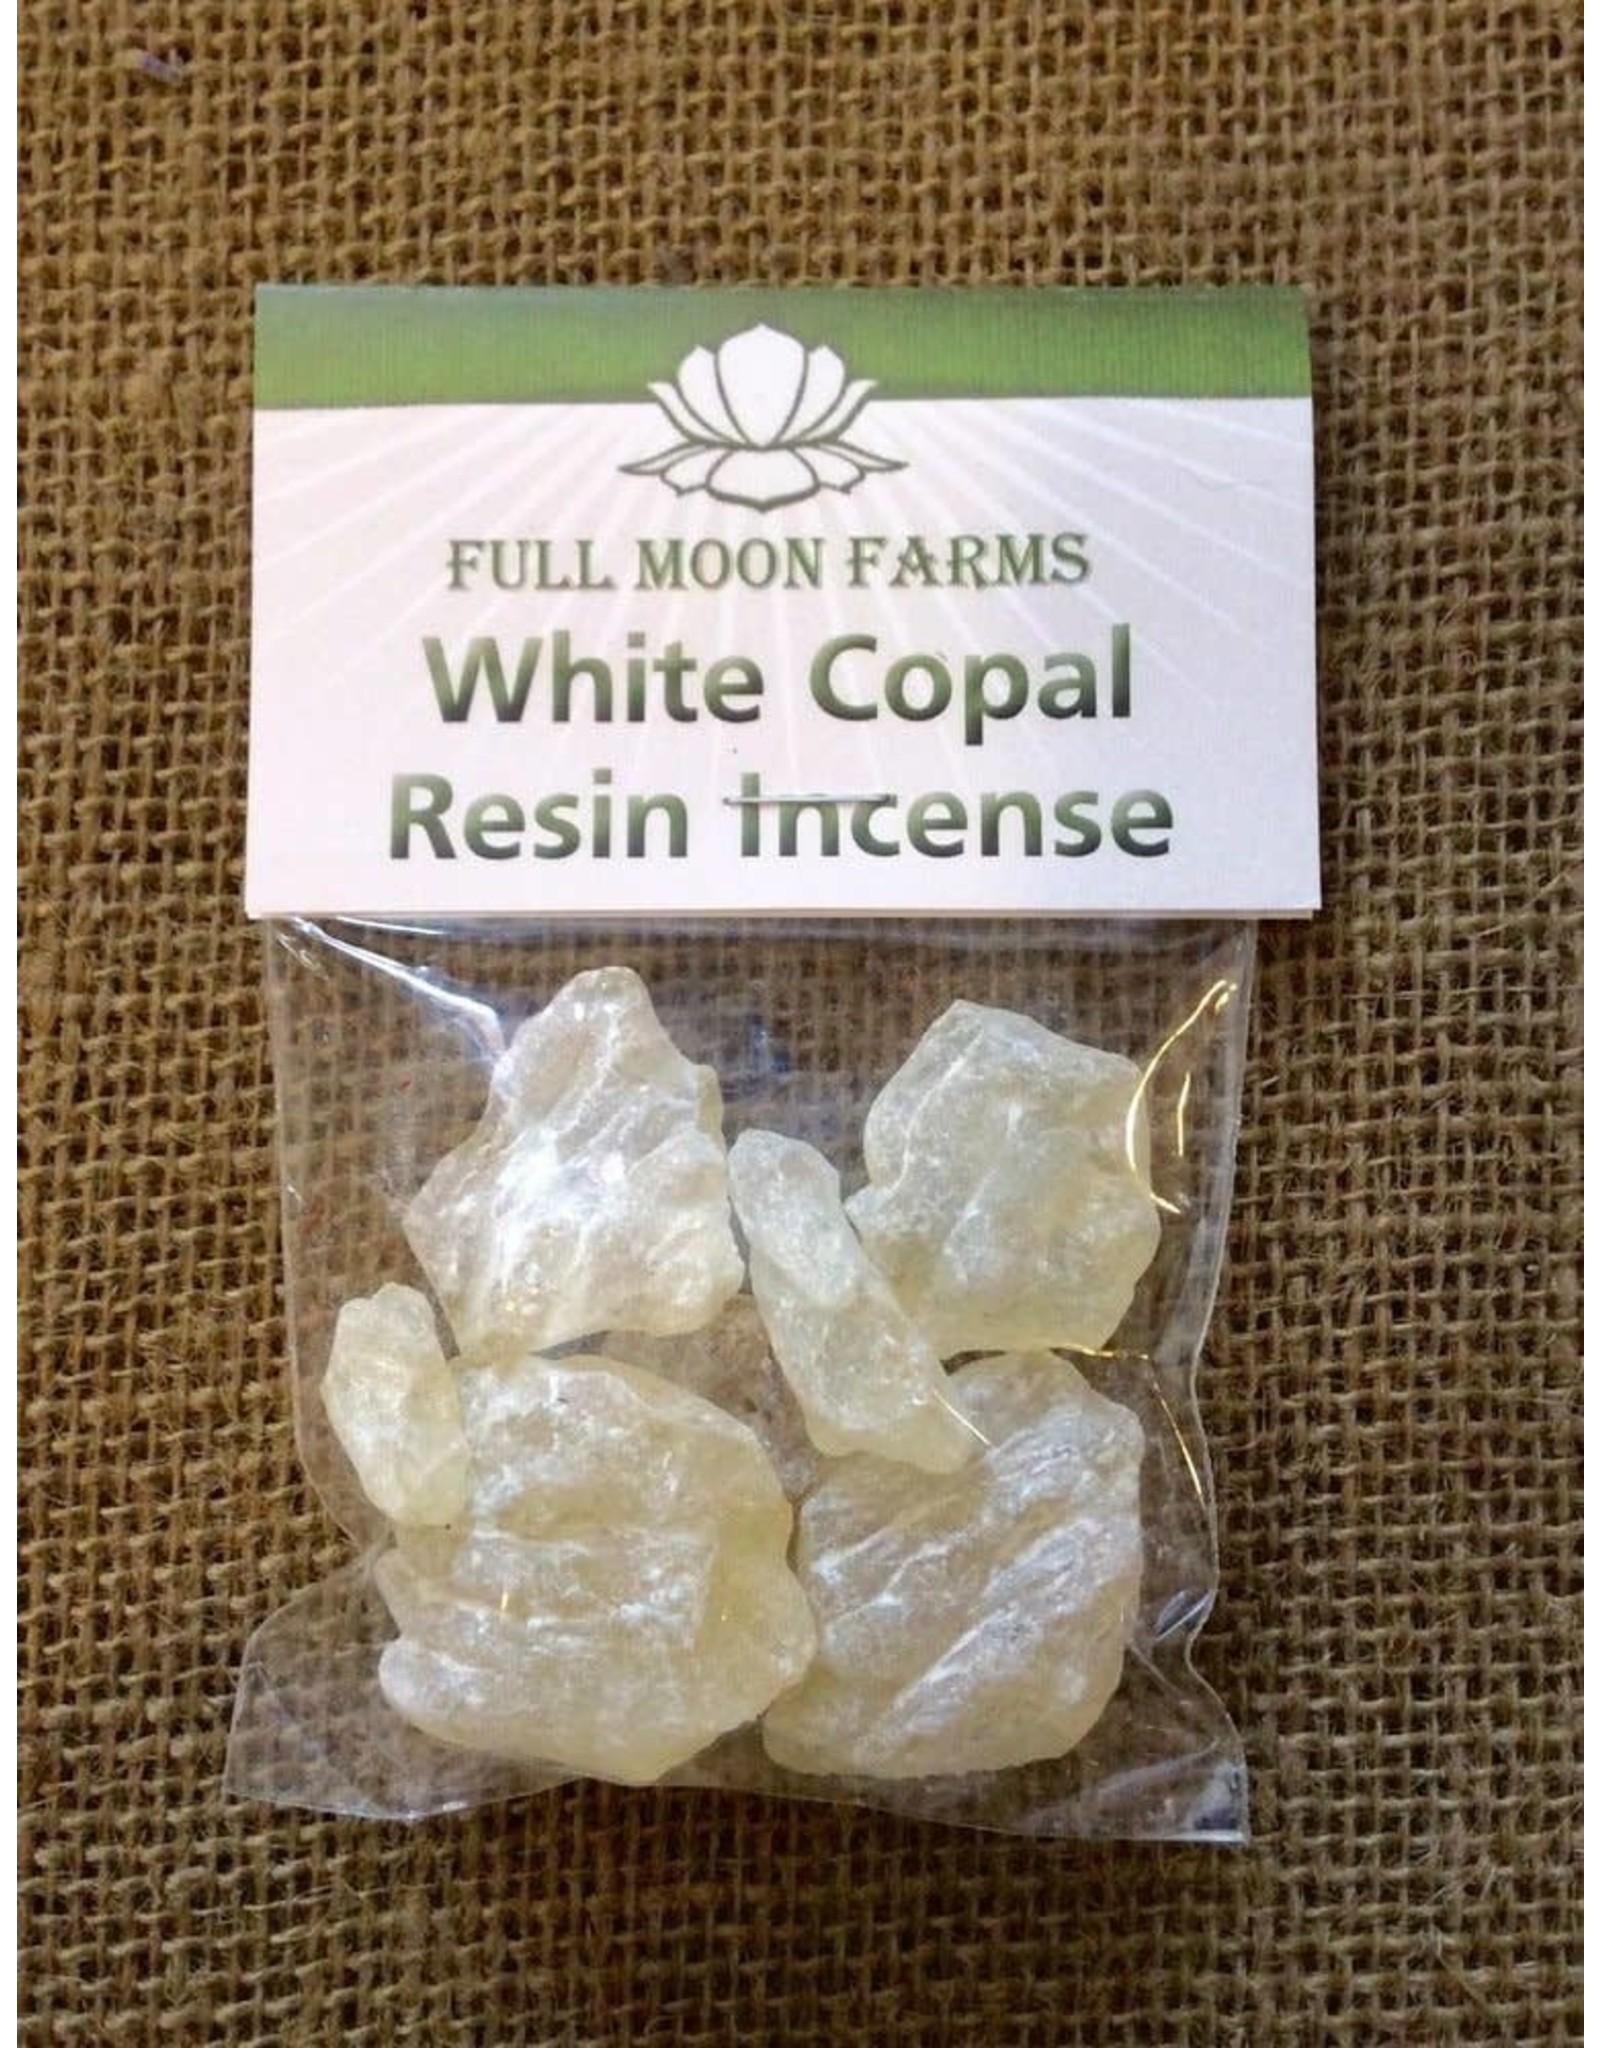 Full Moons Farms Resin Incense   White Copal